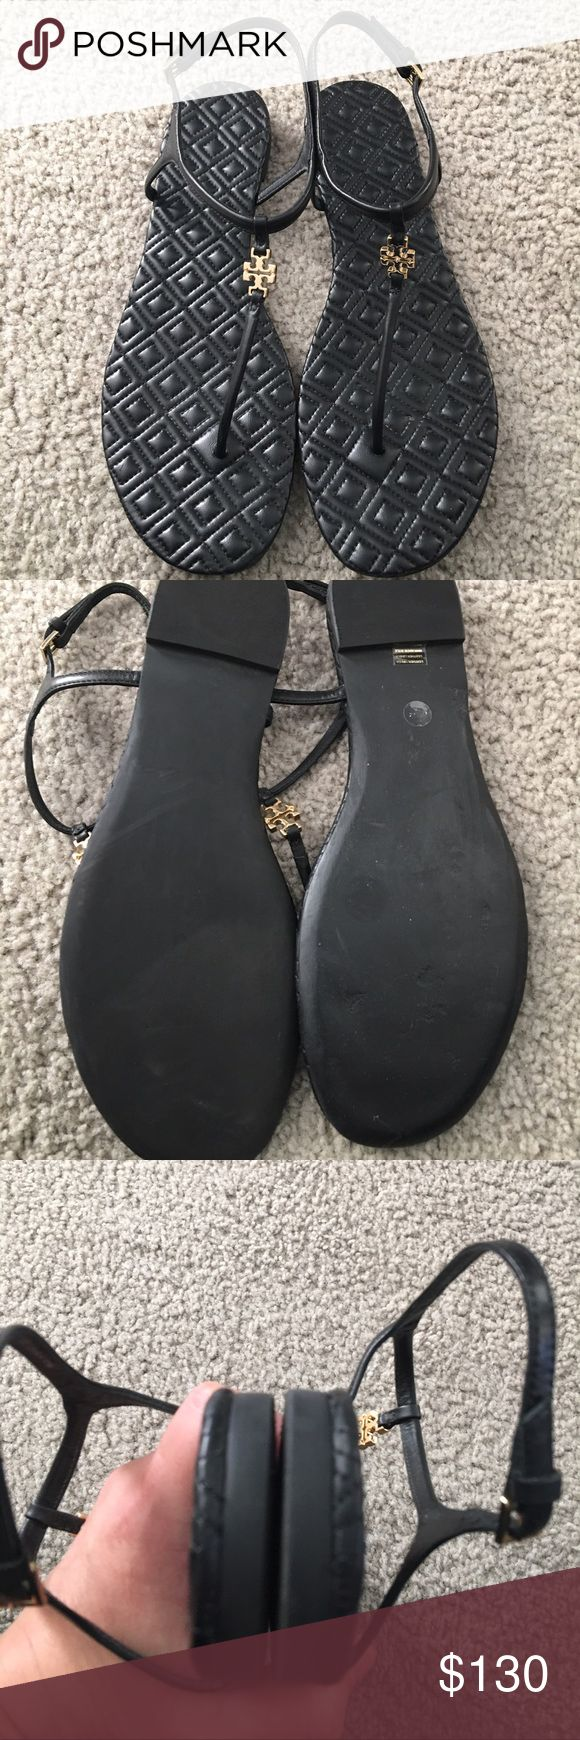 Tory Burch Thong logo sandals